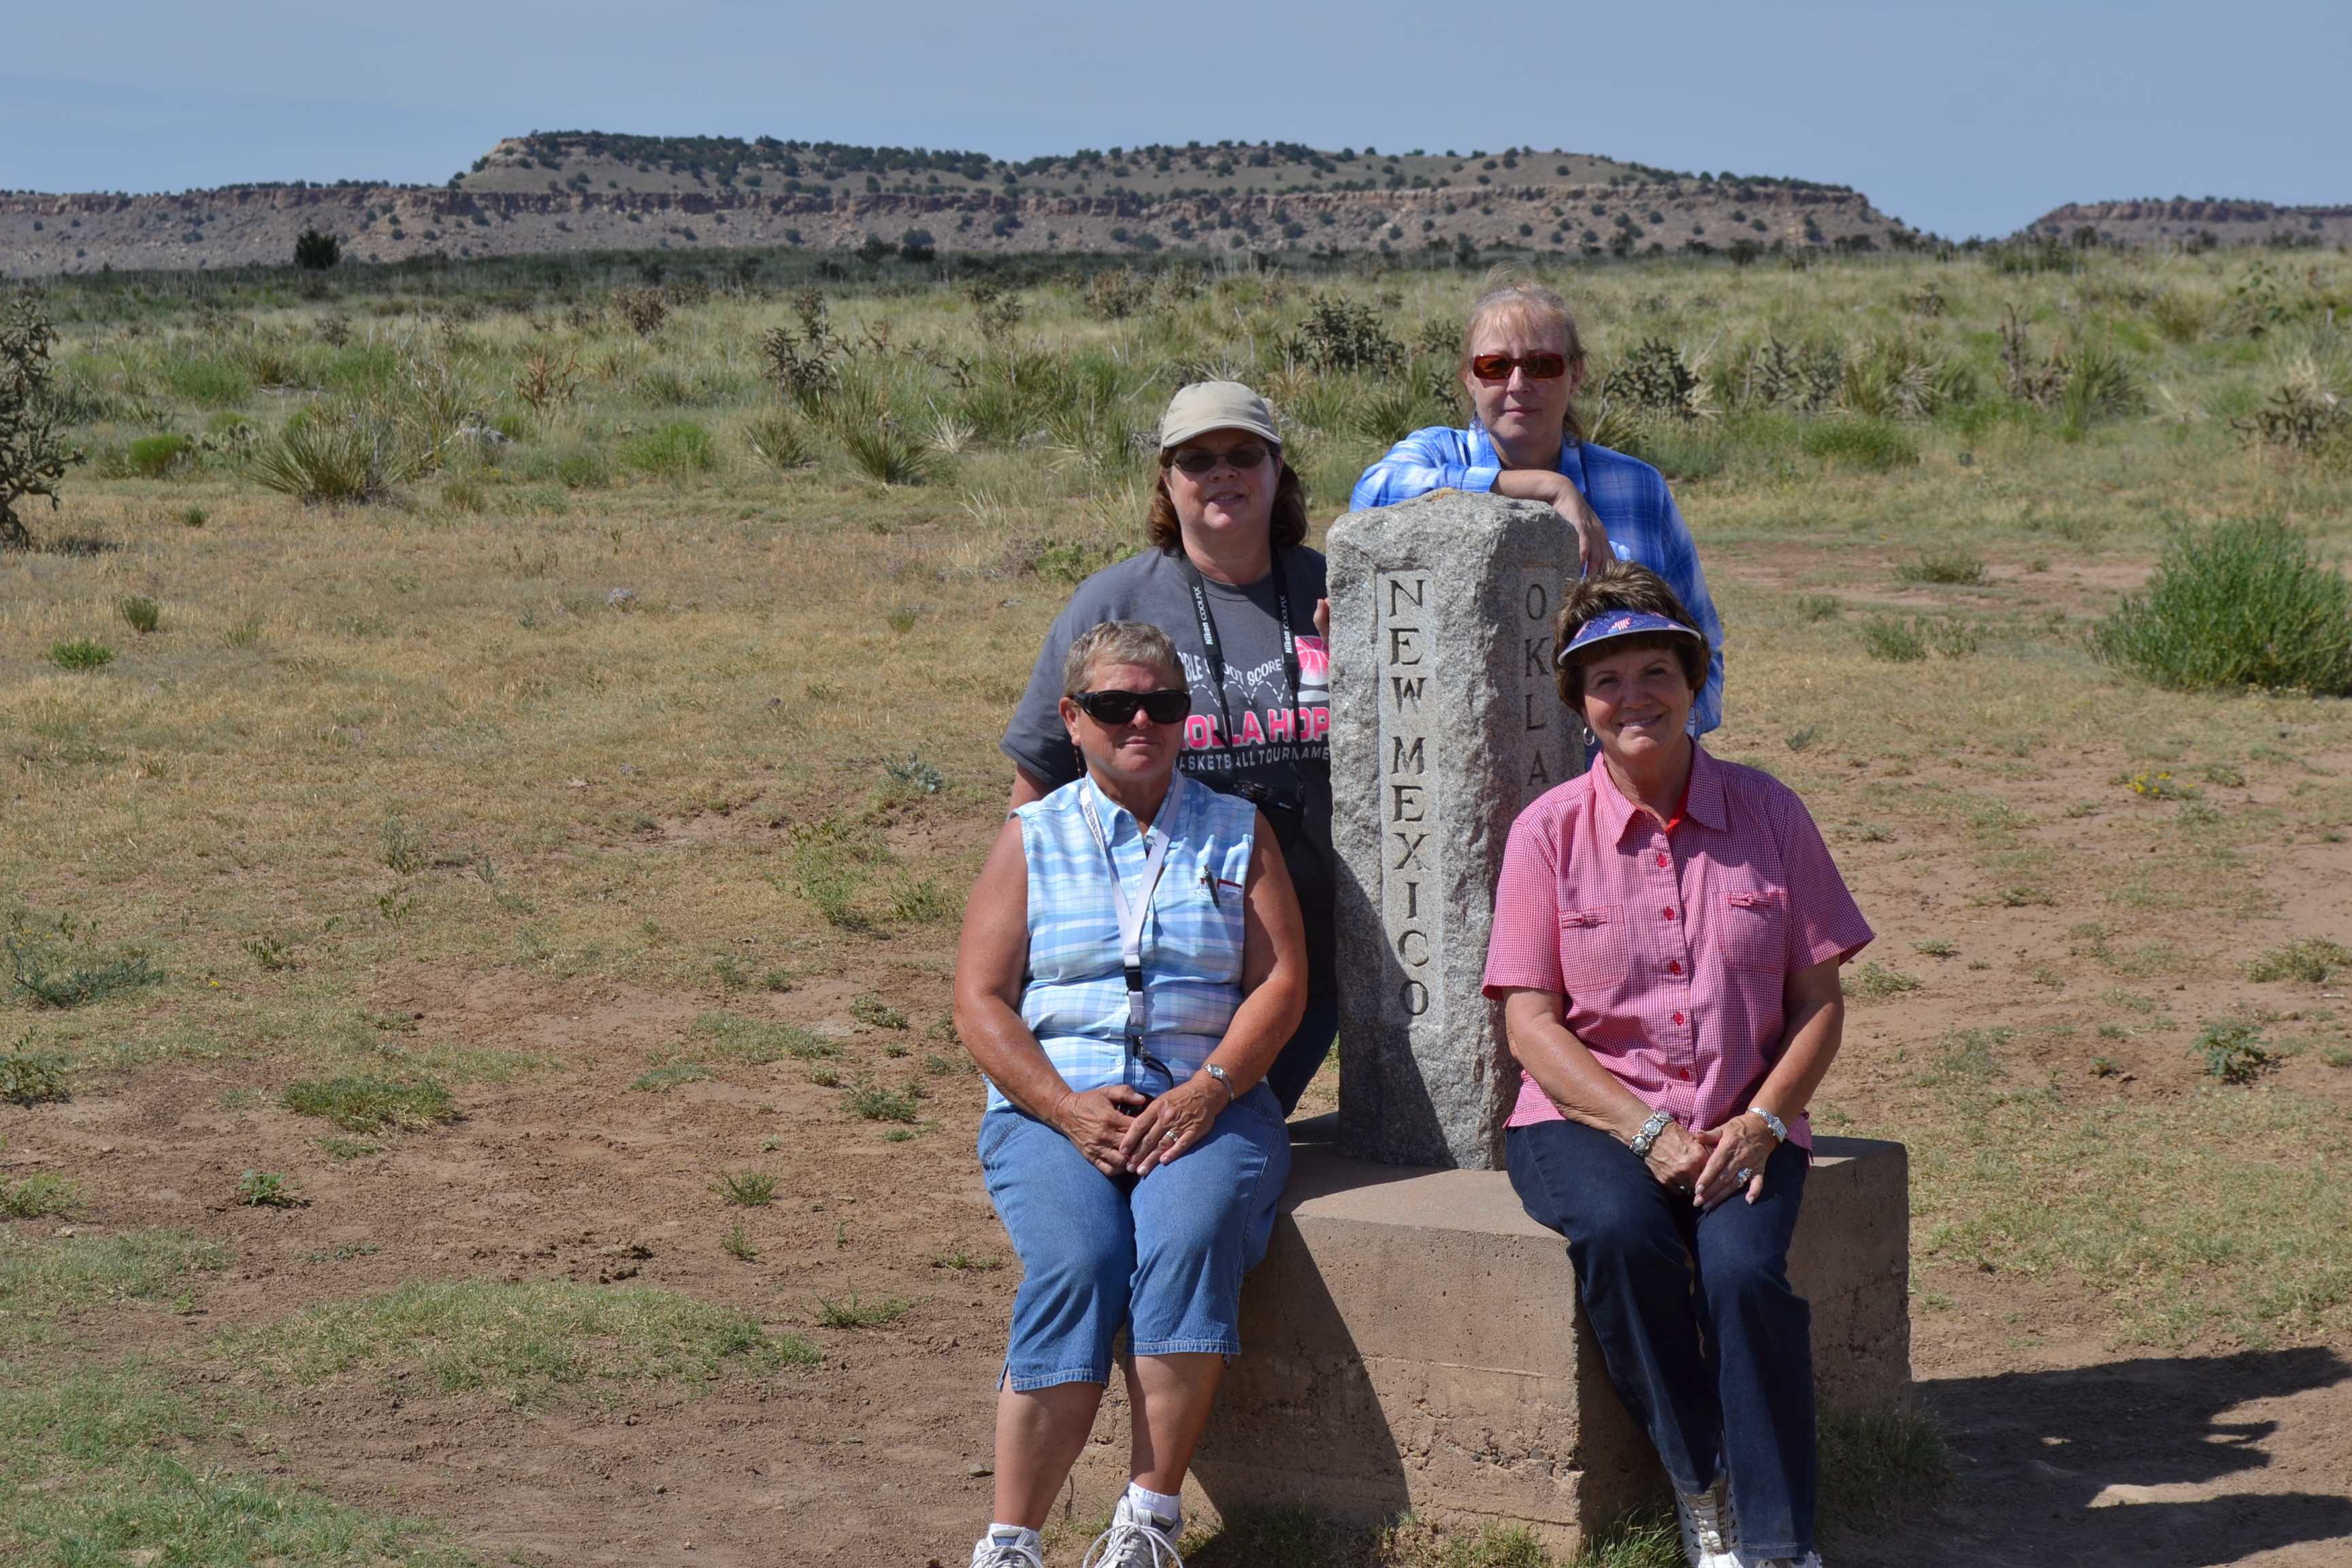 KW Three State Marker, Koleta, Judi, Donette, Kathy